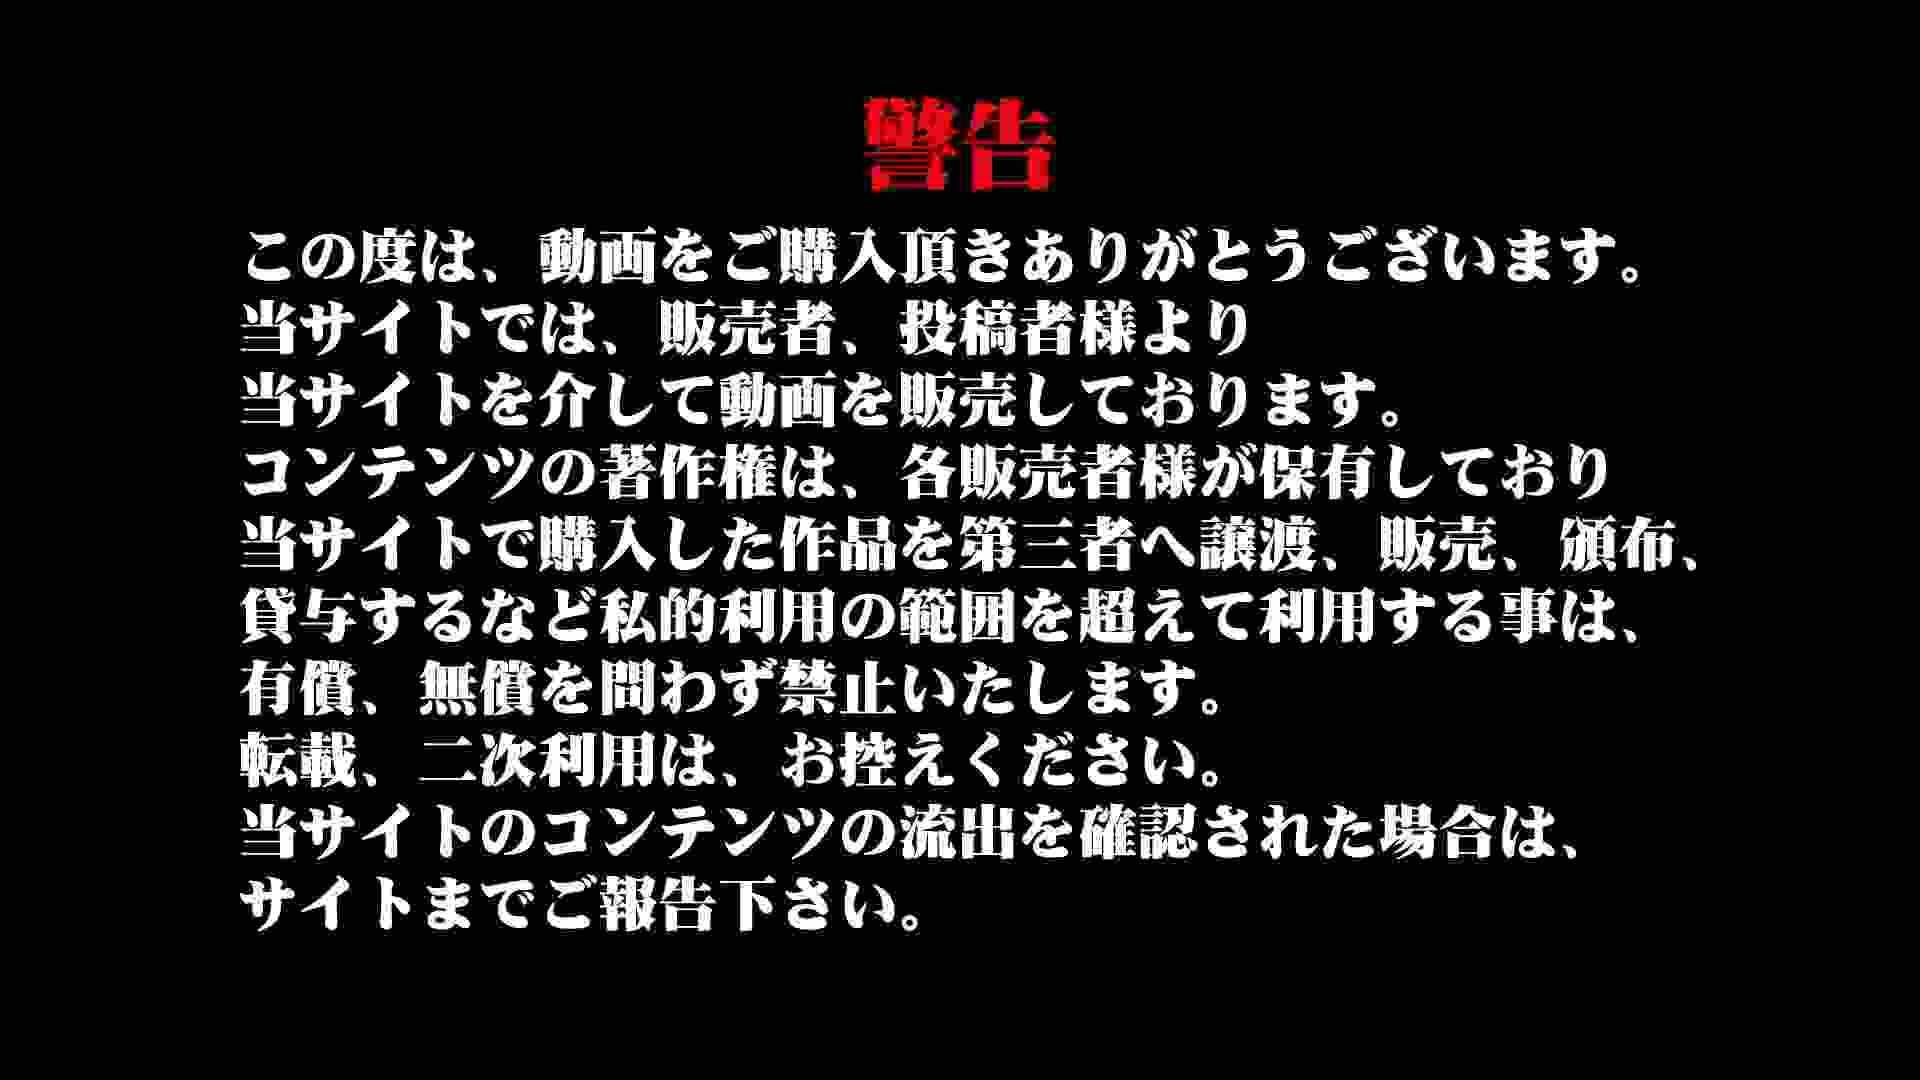 Aquaな露天風呂Vol.902 盗撮師作品 | 露天風呂突入  104pic 1